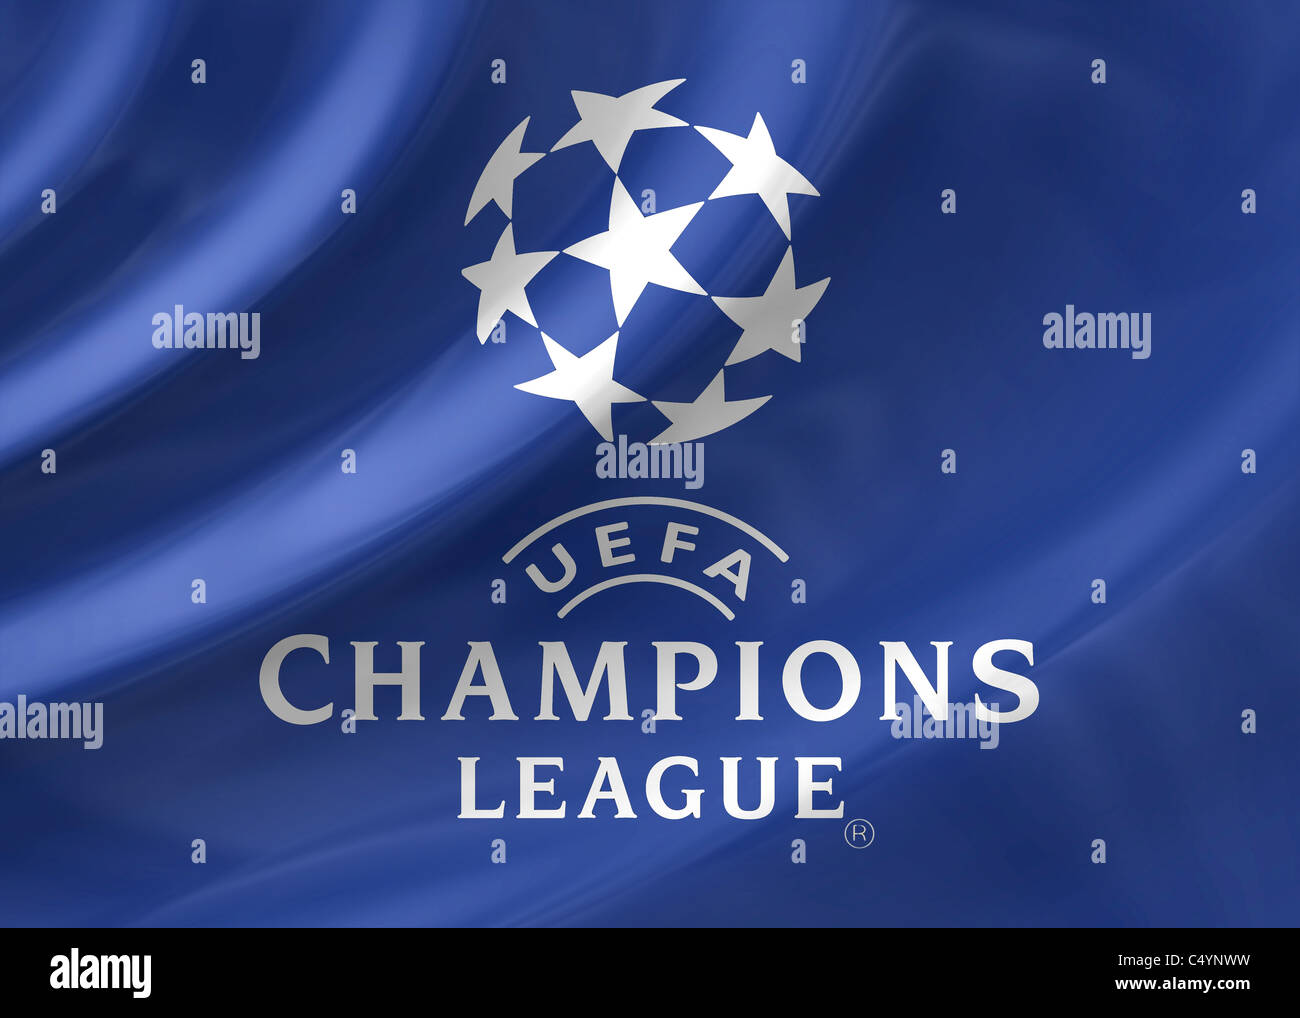 champions league uefa logo flag symbol icon stock photo